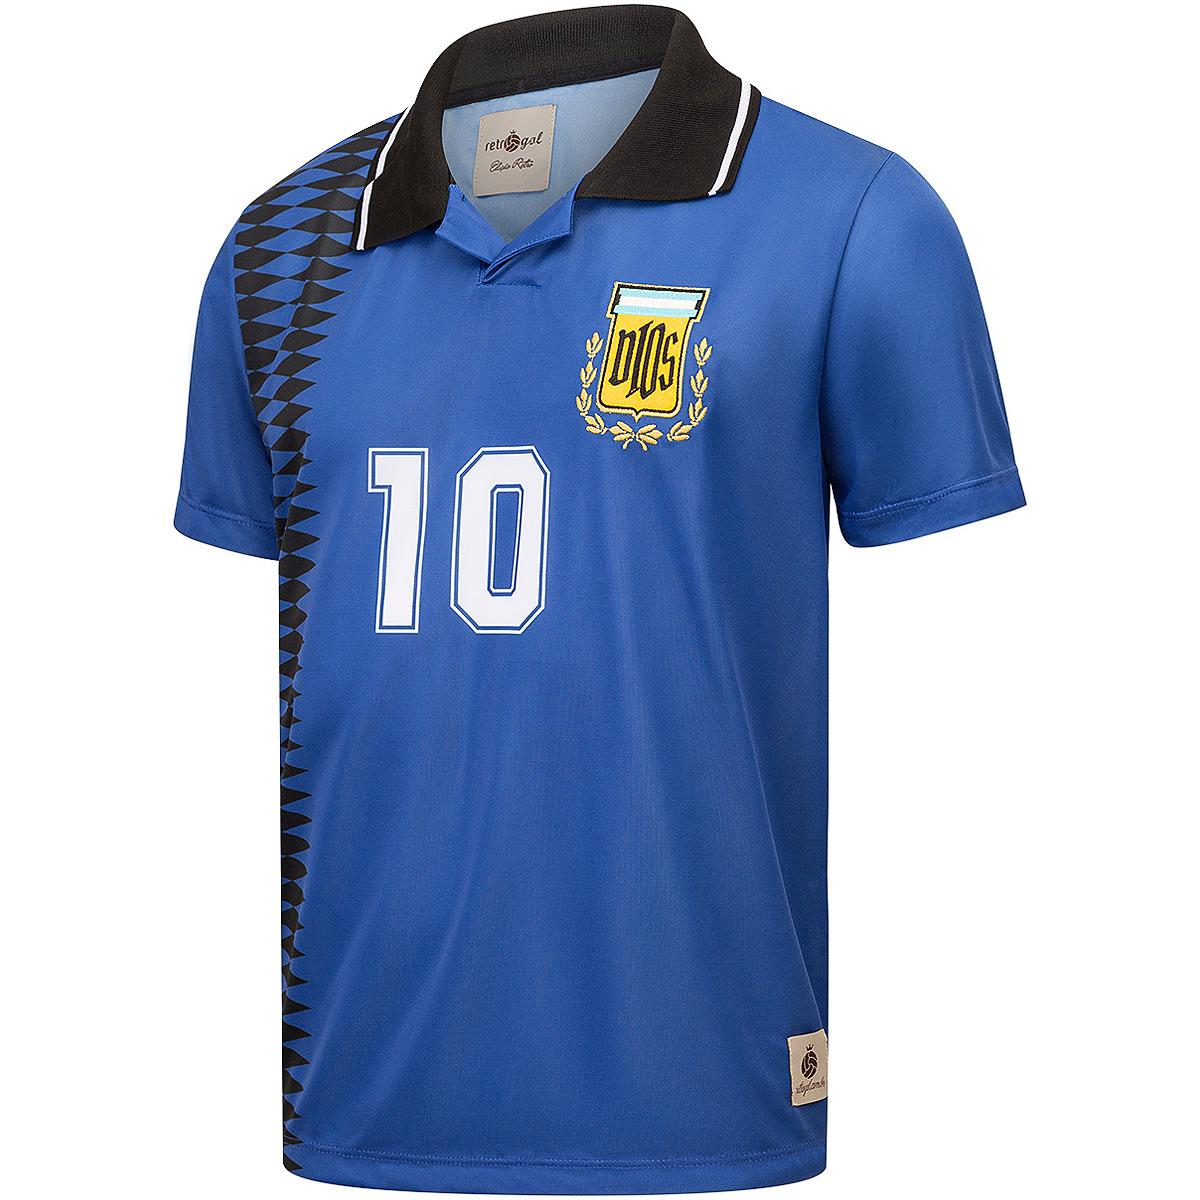 Camisa Argentina 1994 Retrô Masculina